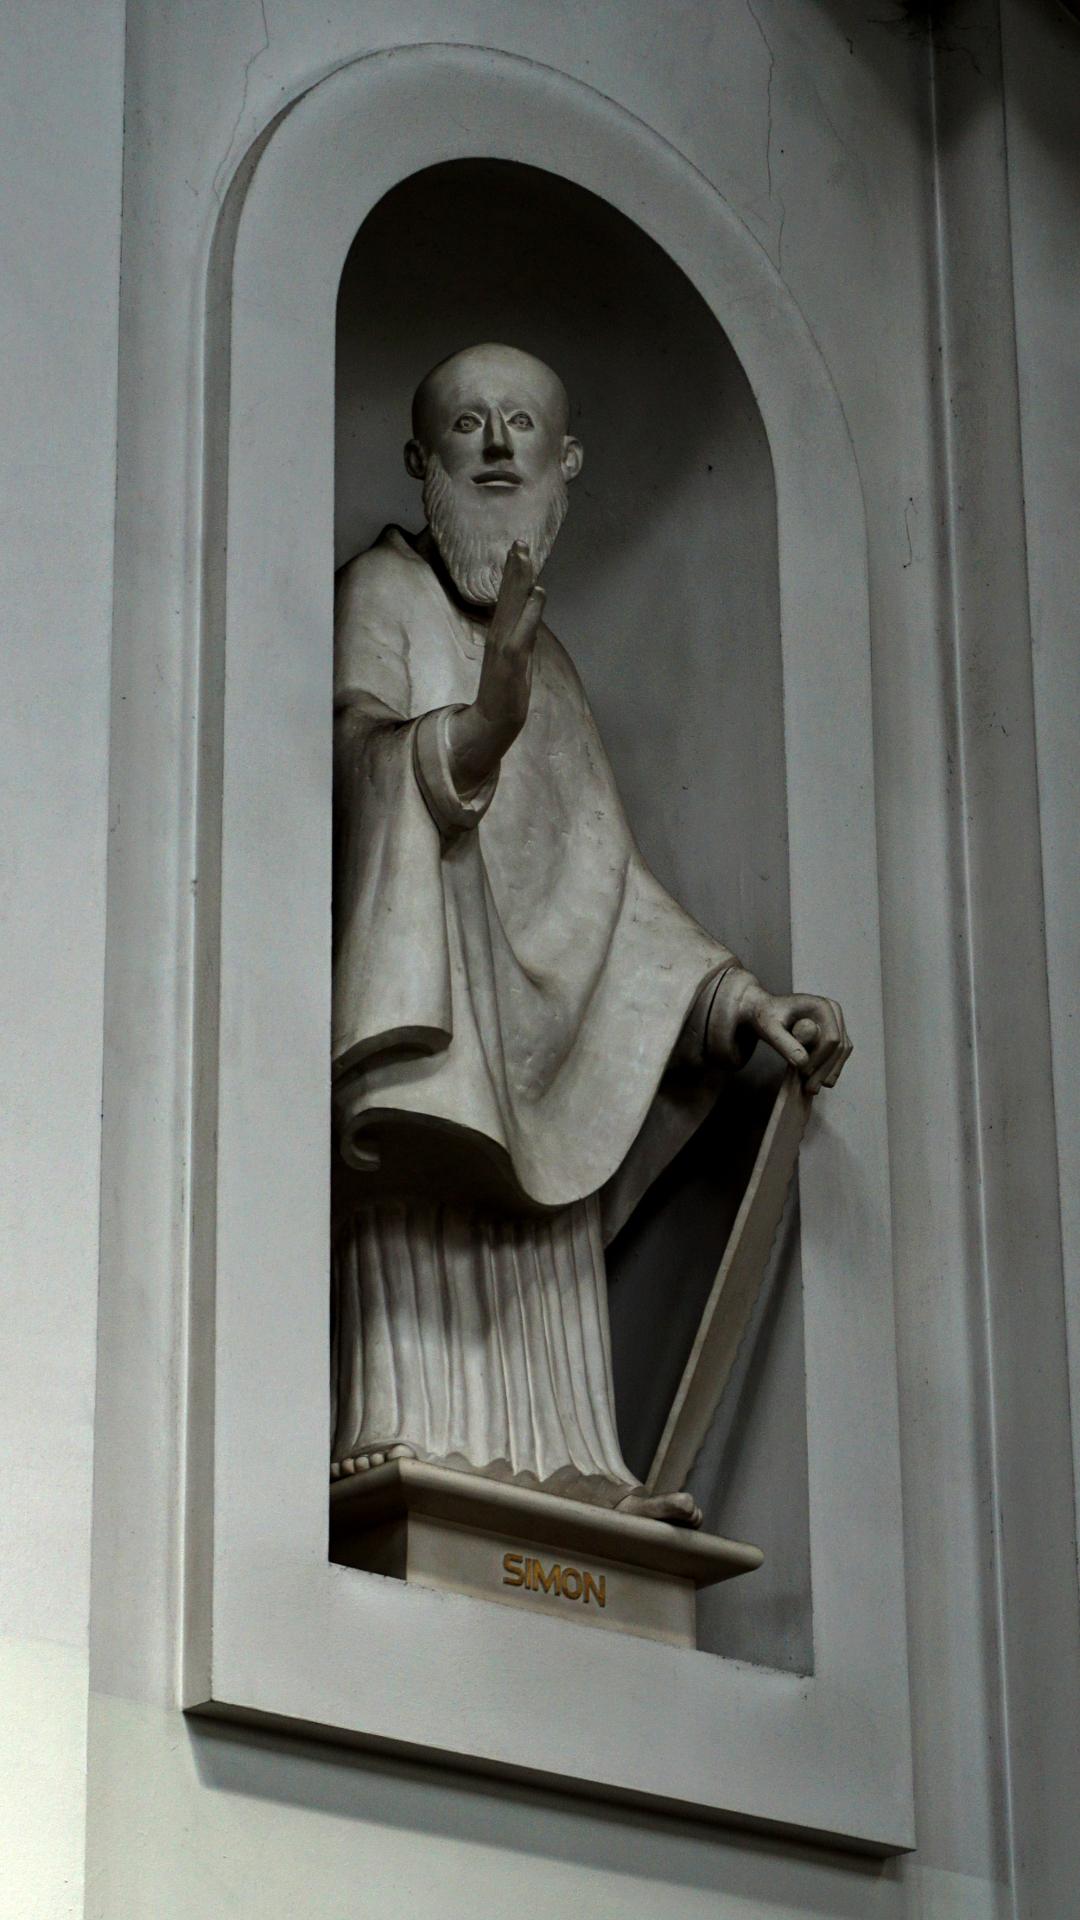 Statue des Apostels Simon Petrus in St. Clemens, Hannover — Experiment